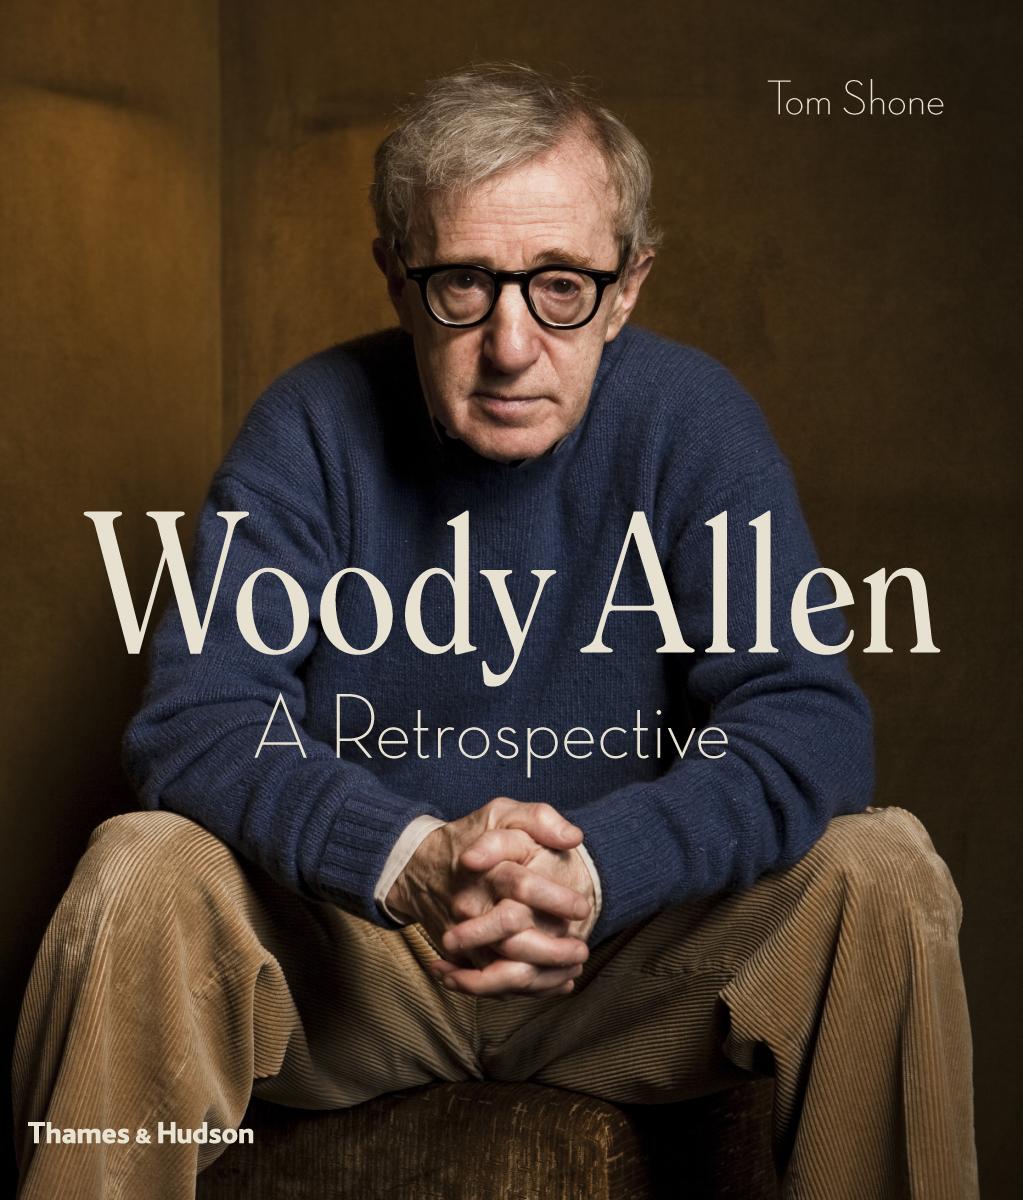 WoodyAllenbookcover.jpg